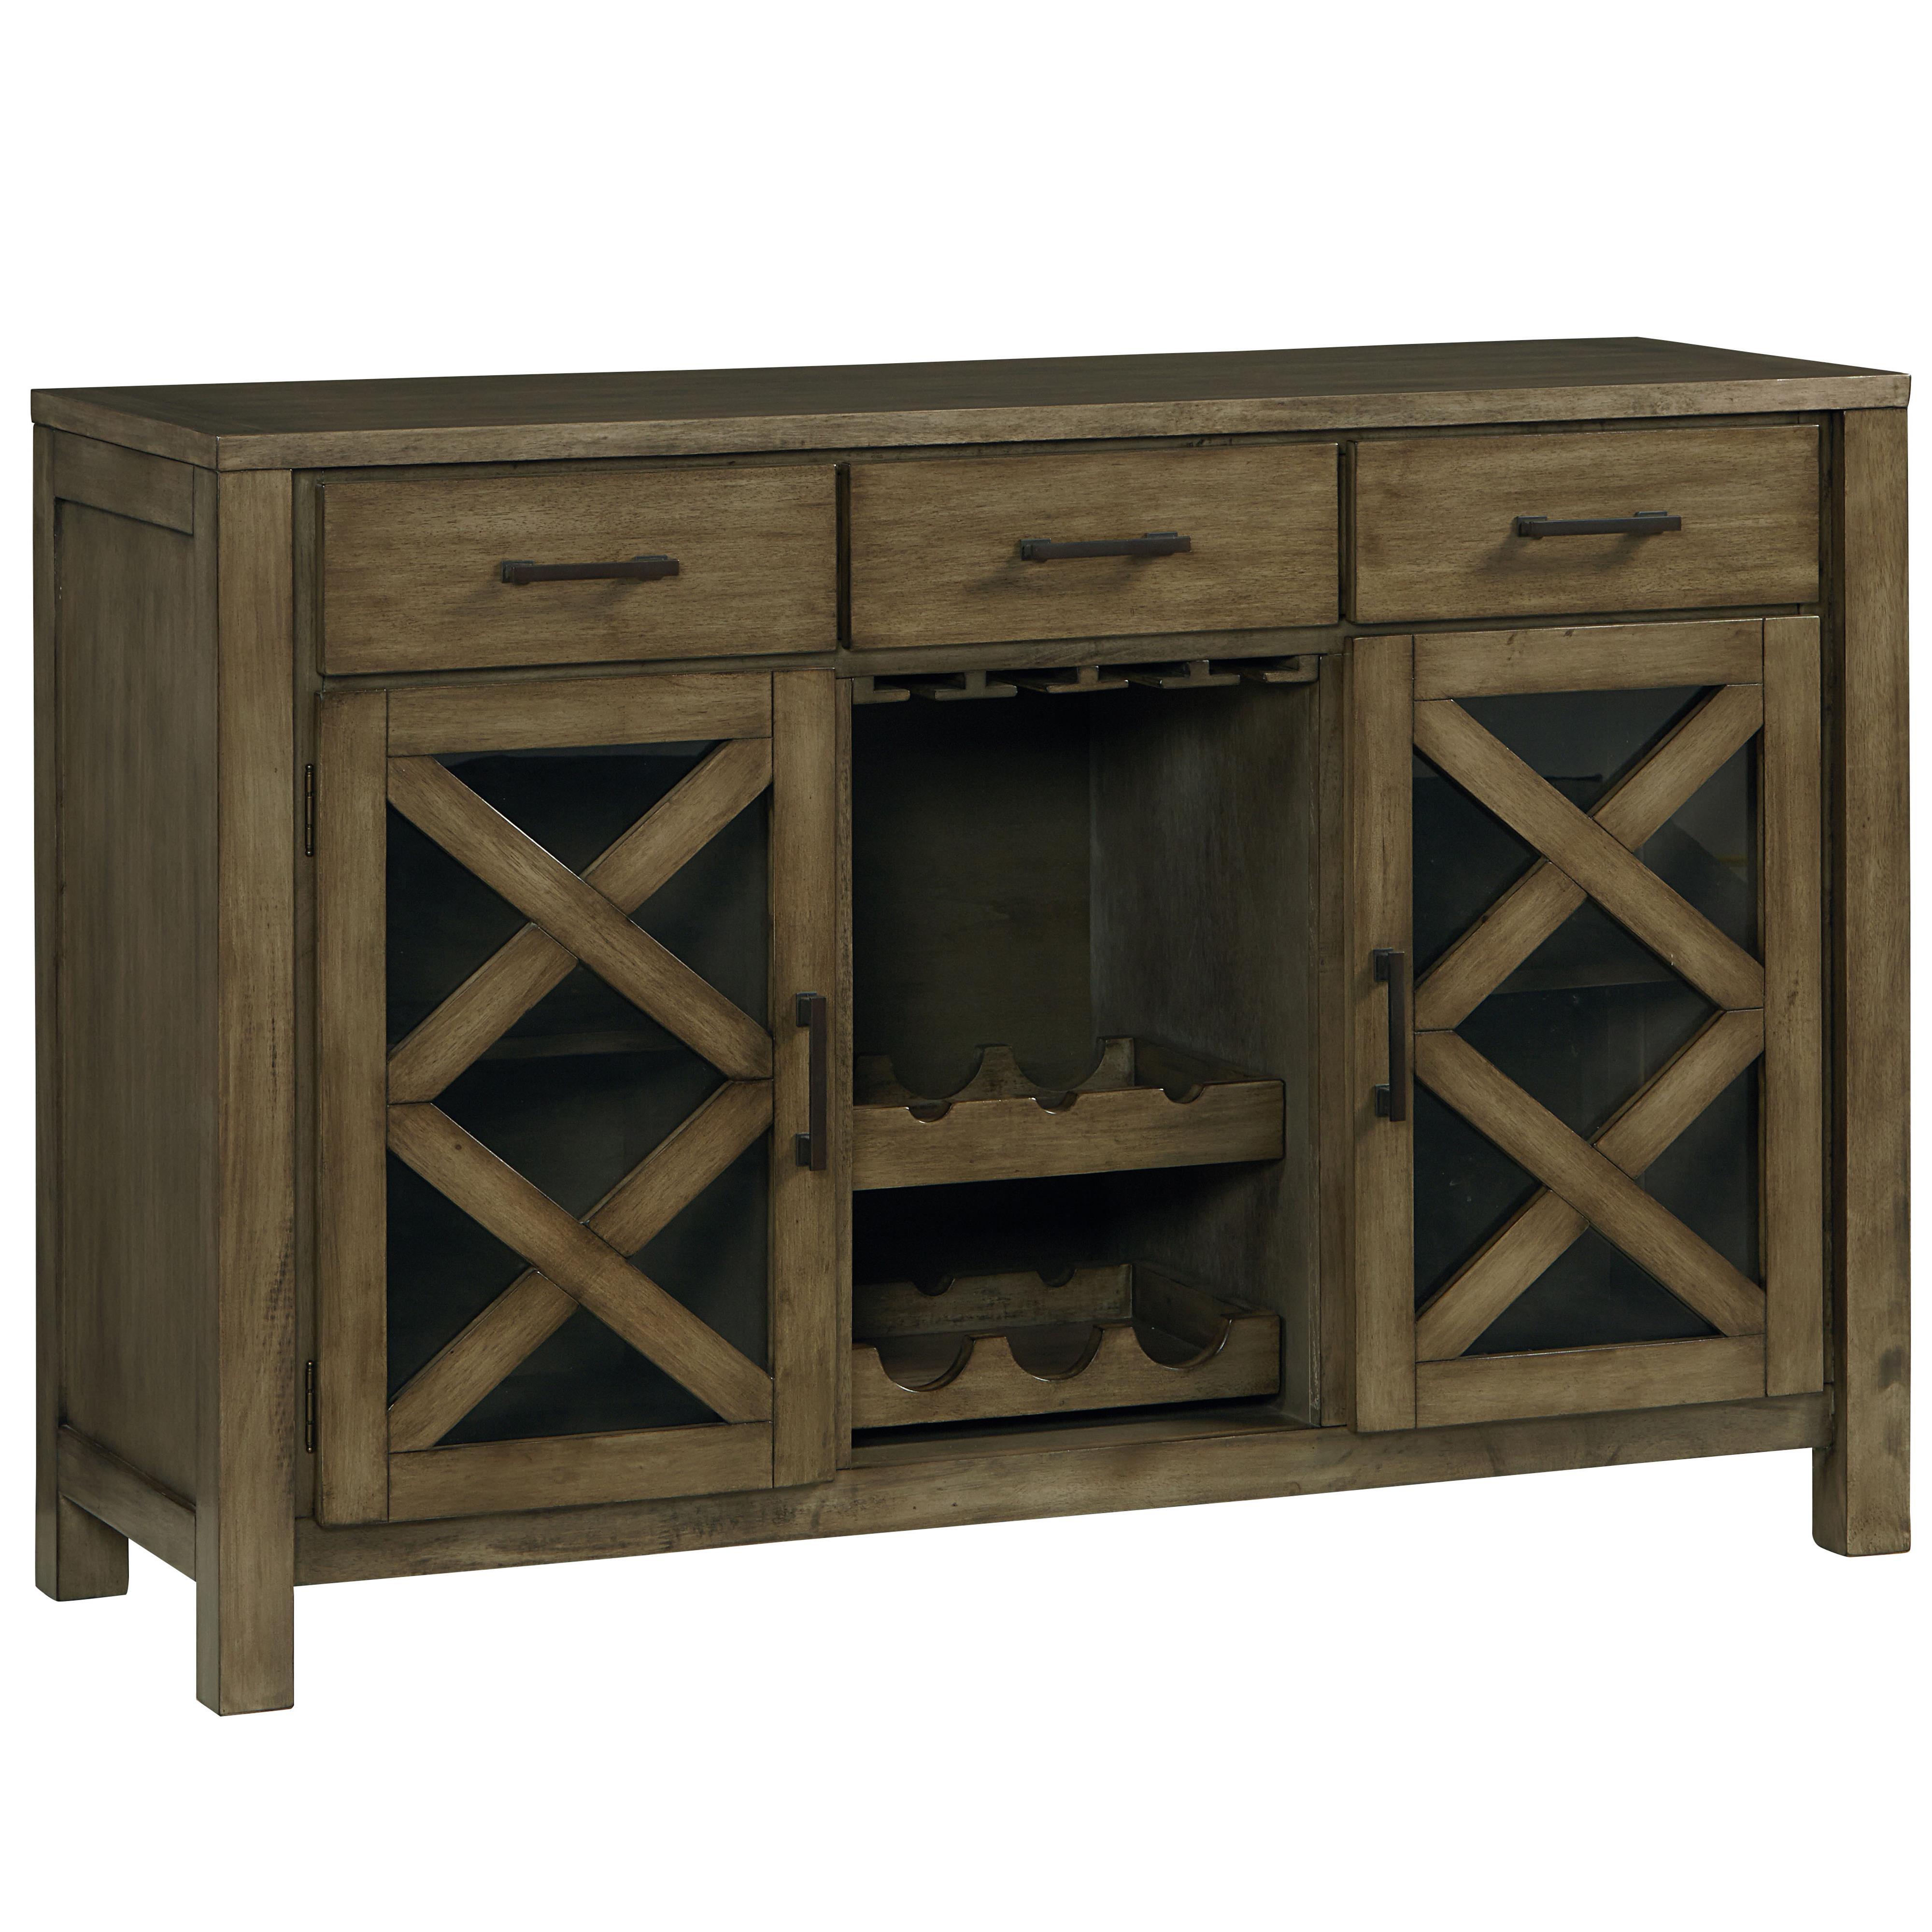 Standard Furniture Omaha Grey Sideboard - Item Number: 16682